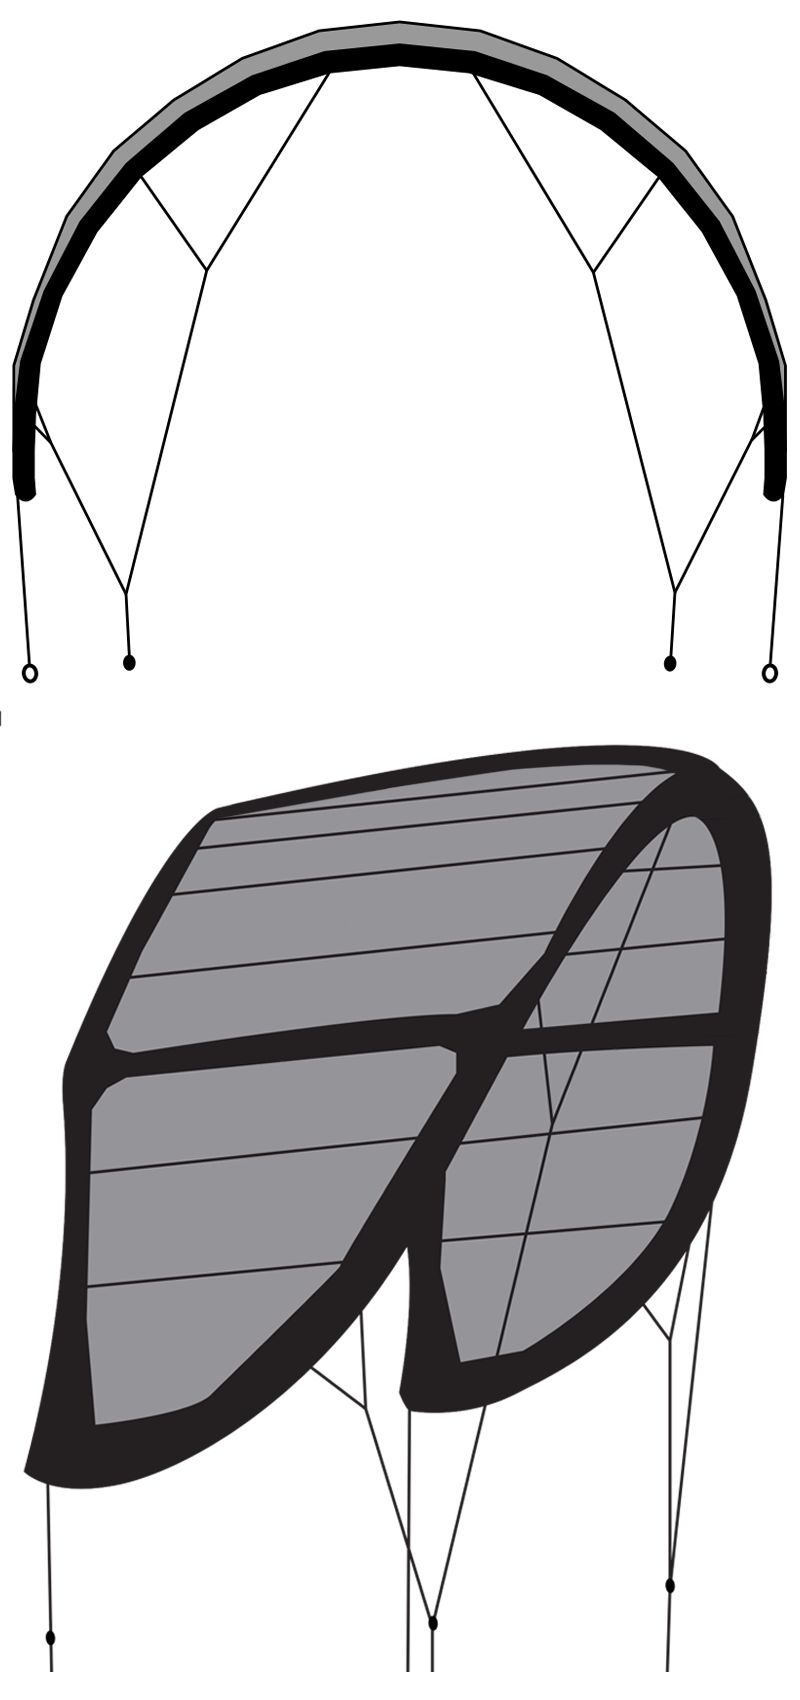 3 aile de kitesurf 2 lattes shape design